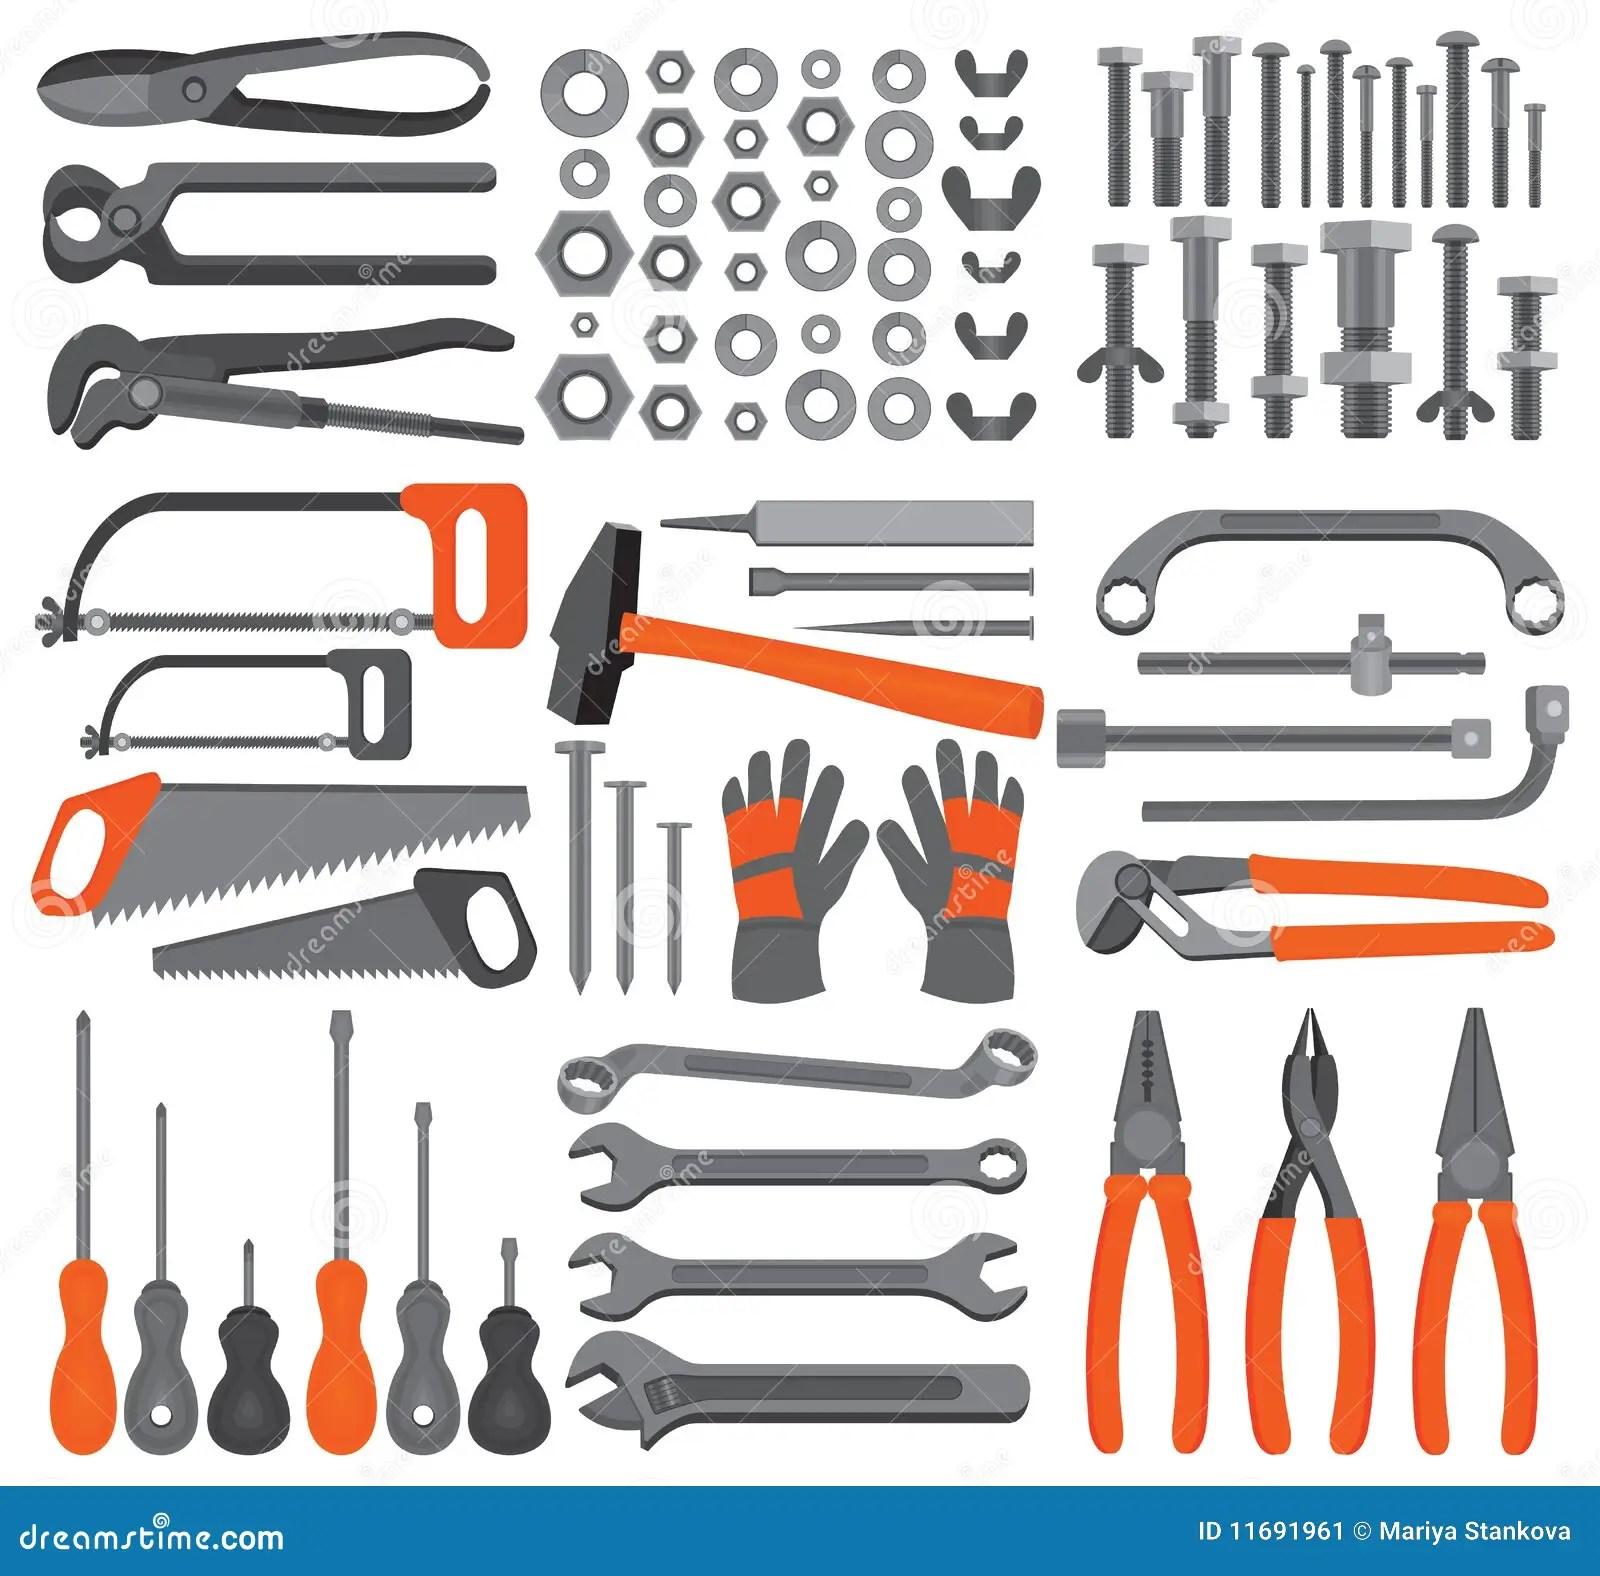 pdf plans hand tools download carpenter�s saw bench